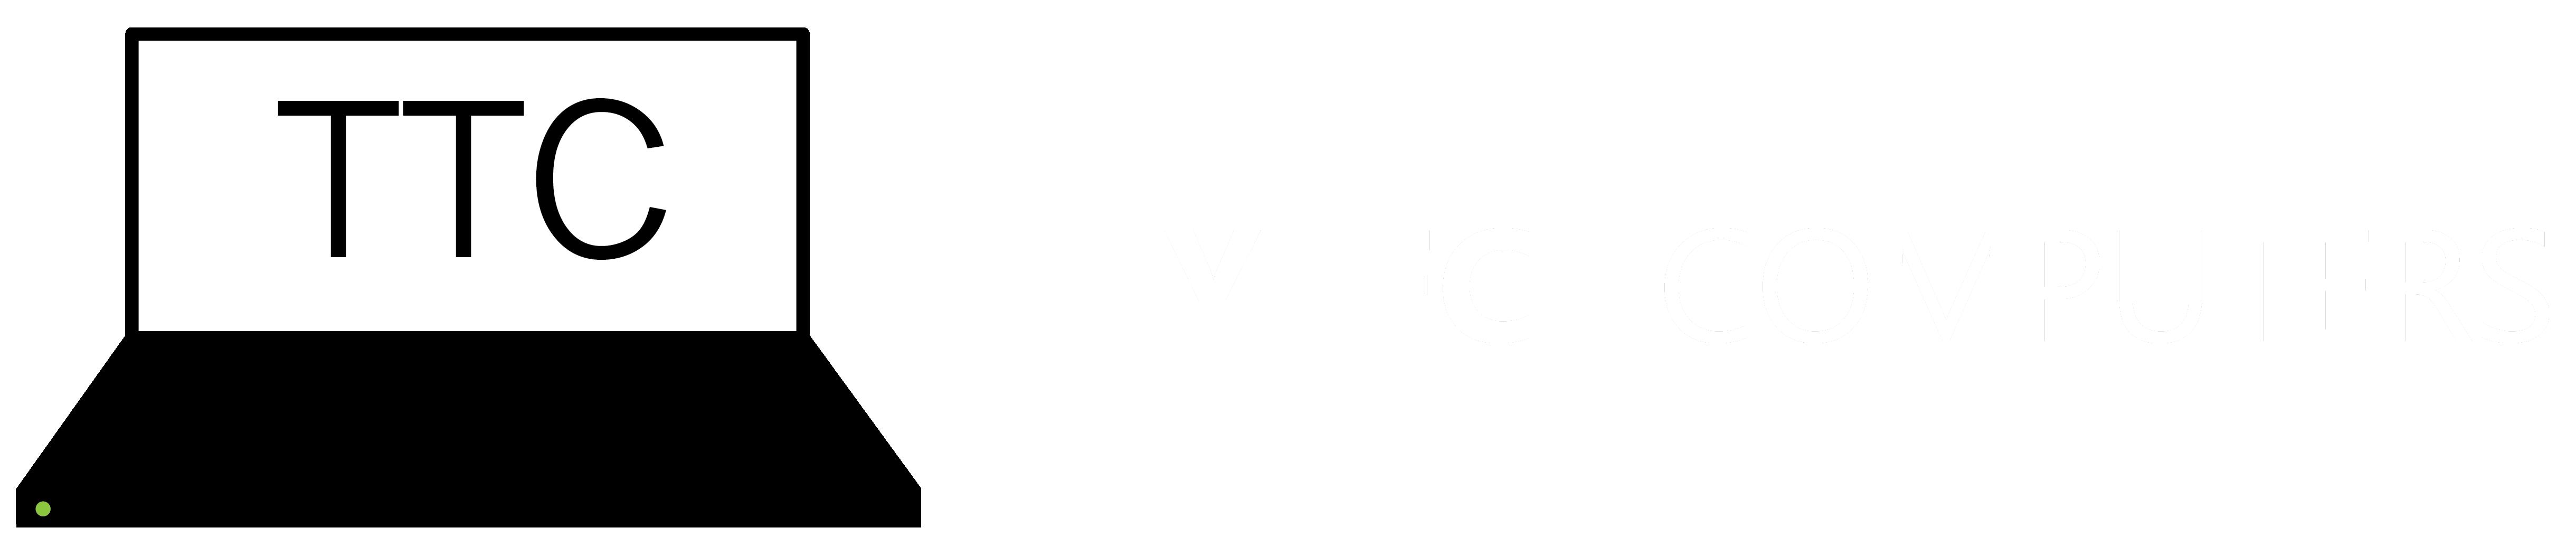 ThyTech - Business IT Support